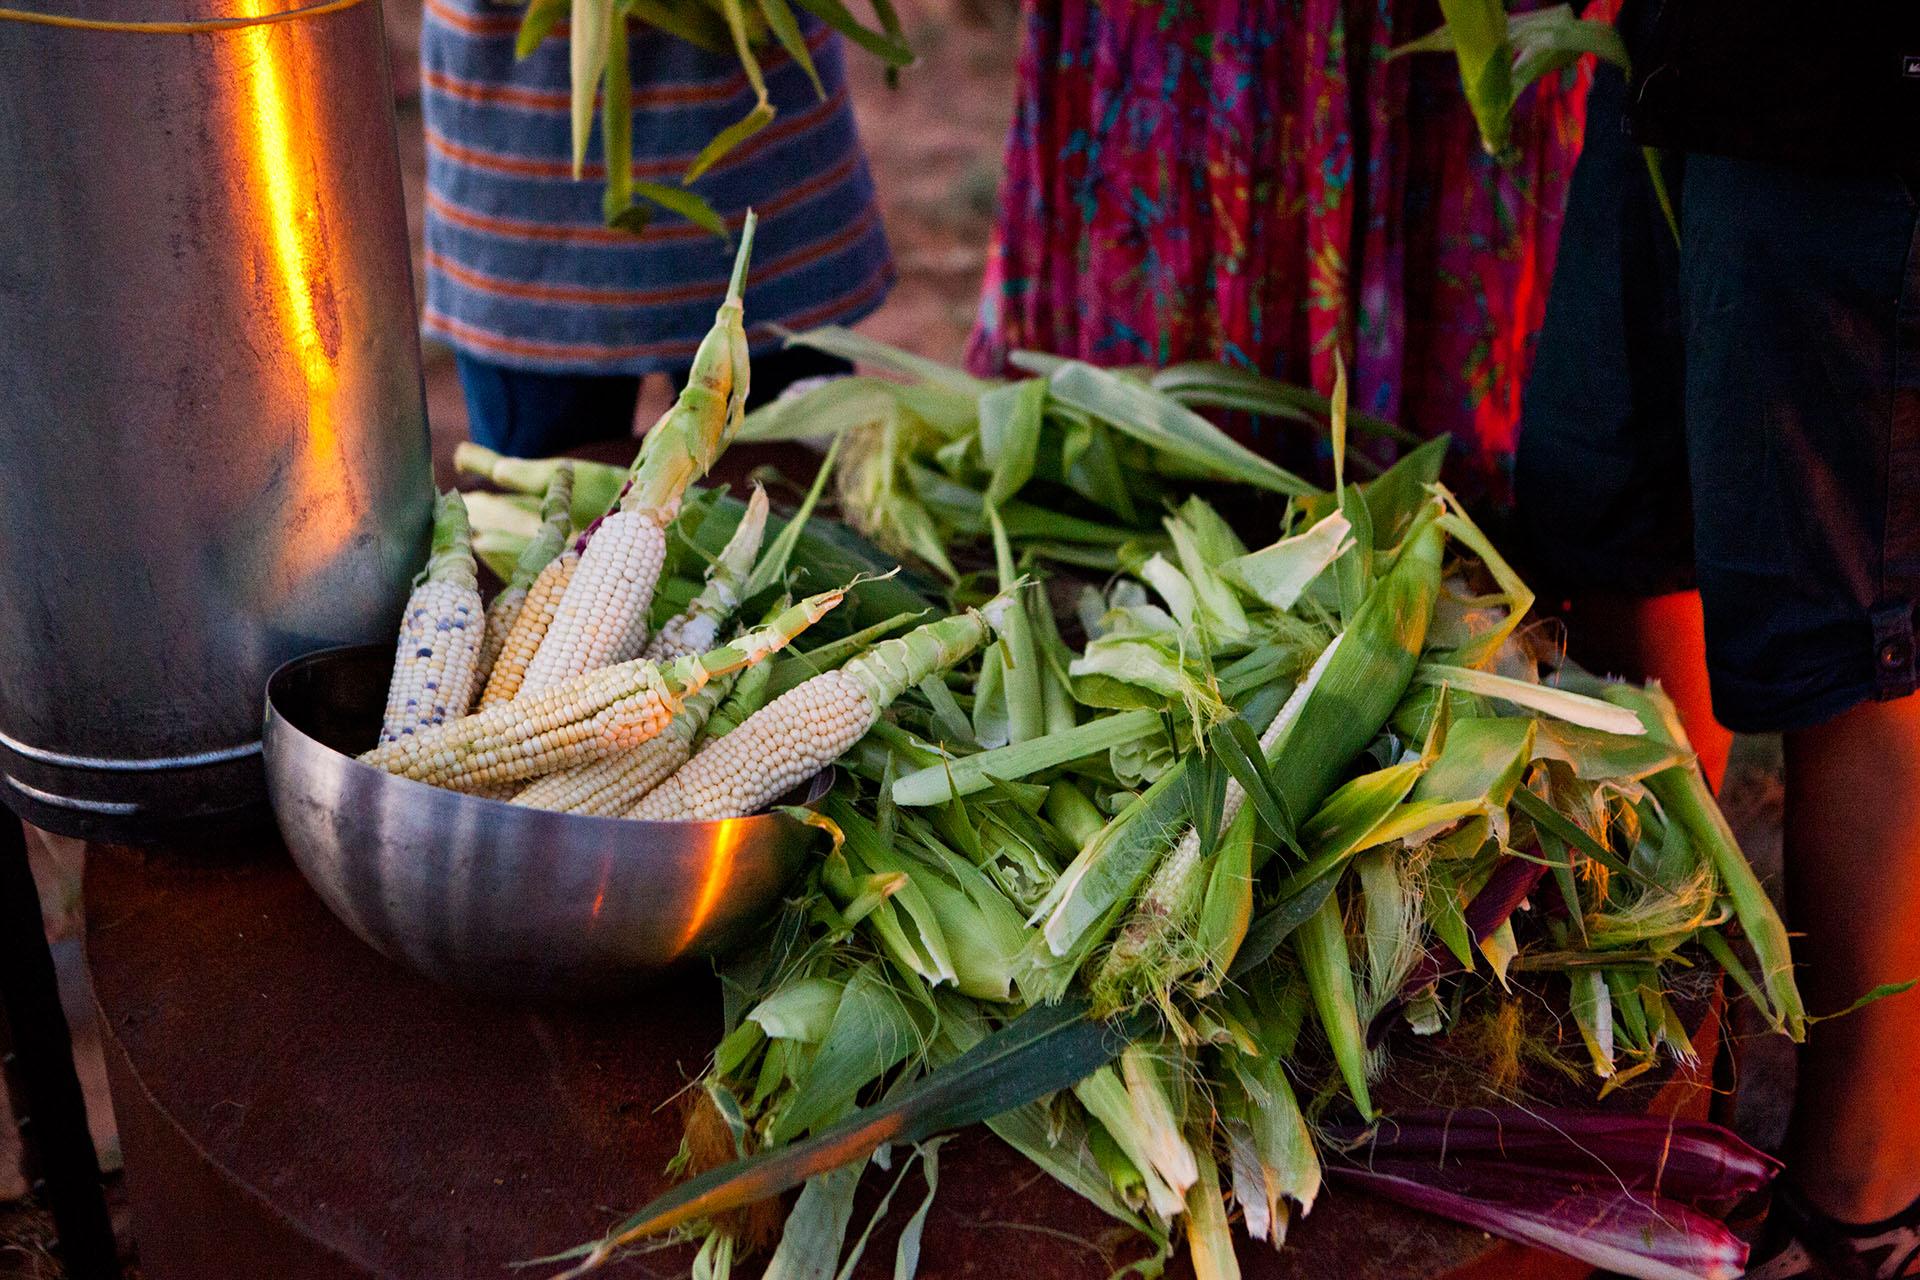 Native American corn prepared by indigenous people